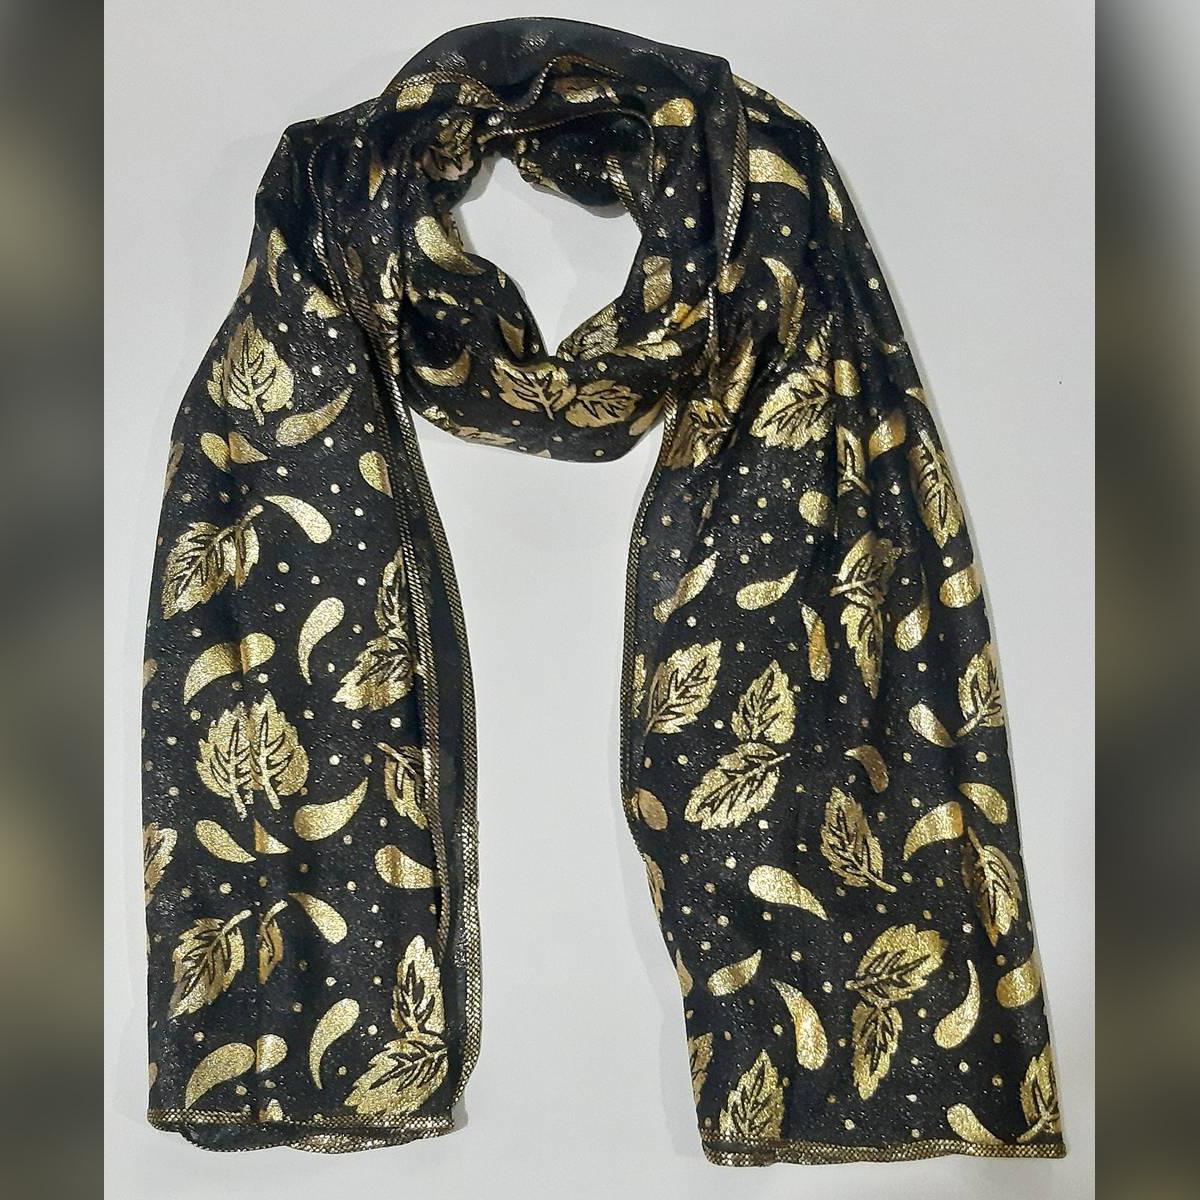 Moonlight Golden Color All Over Printed beautiful fancy dupatta Fashion Summer Season Scarf Thin Shawls and Wraps Lady Female Hijab Soft Neckerchief Long Foulard Head Scarves Stole for Women Girls